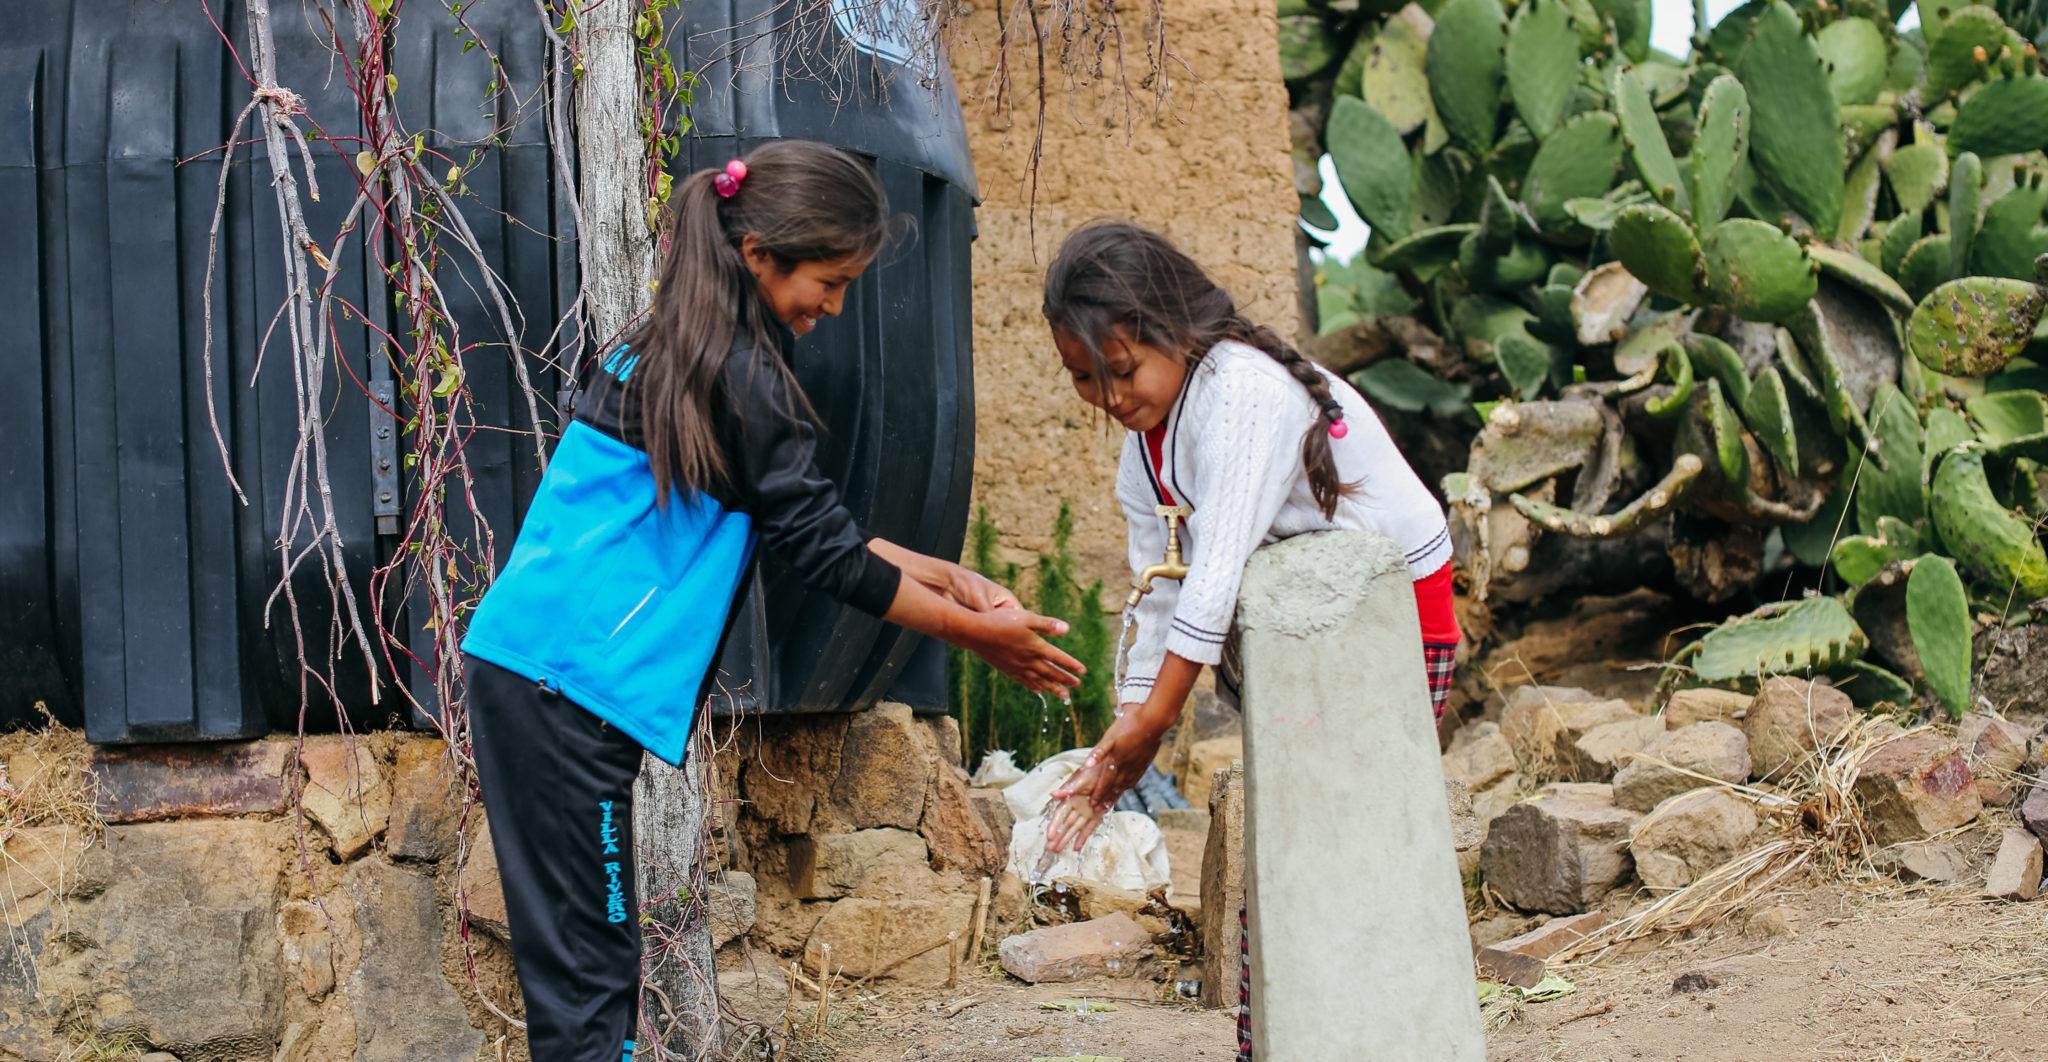 Bolivia02_VillaRivero_Thagoni_20170905-(70-of-120)1